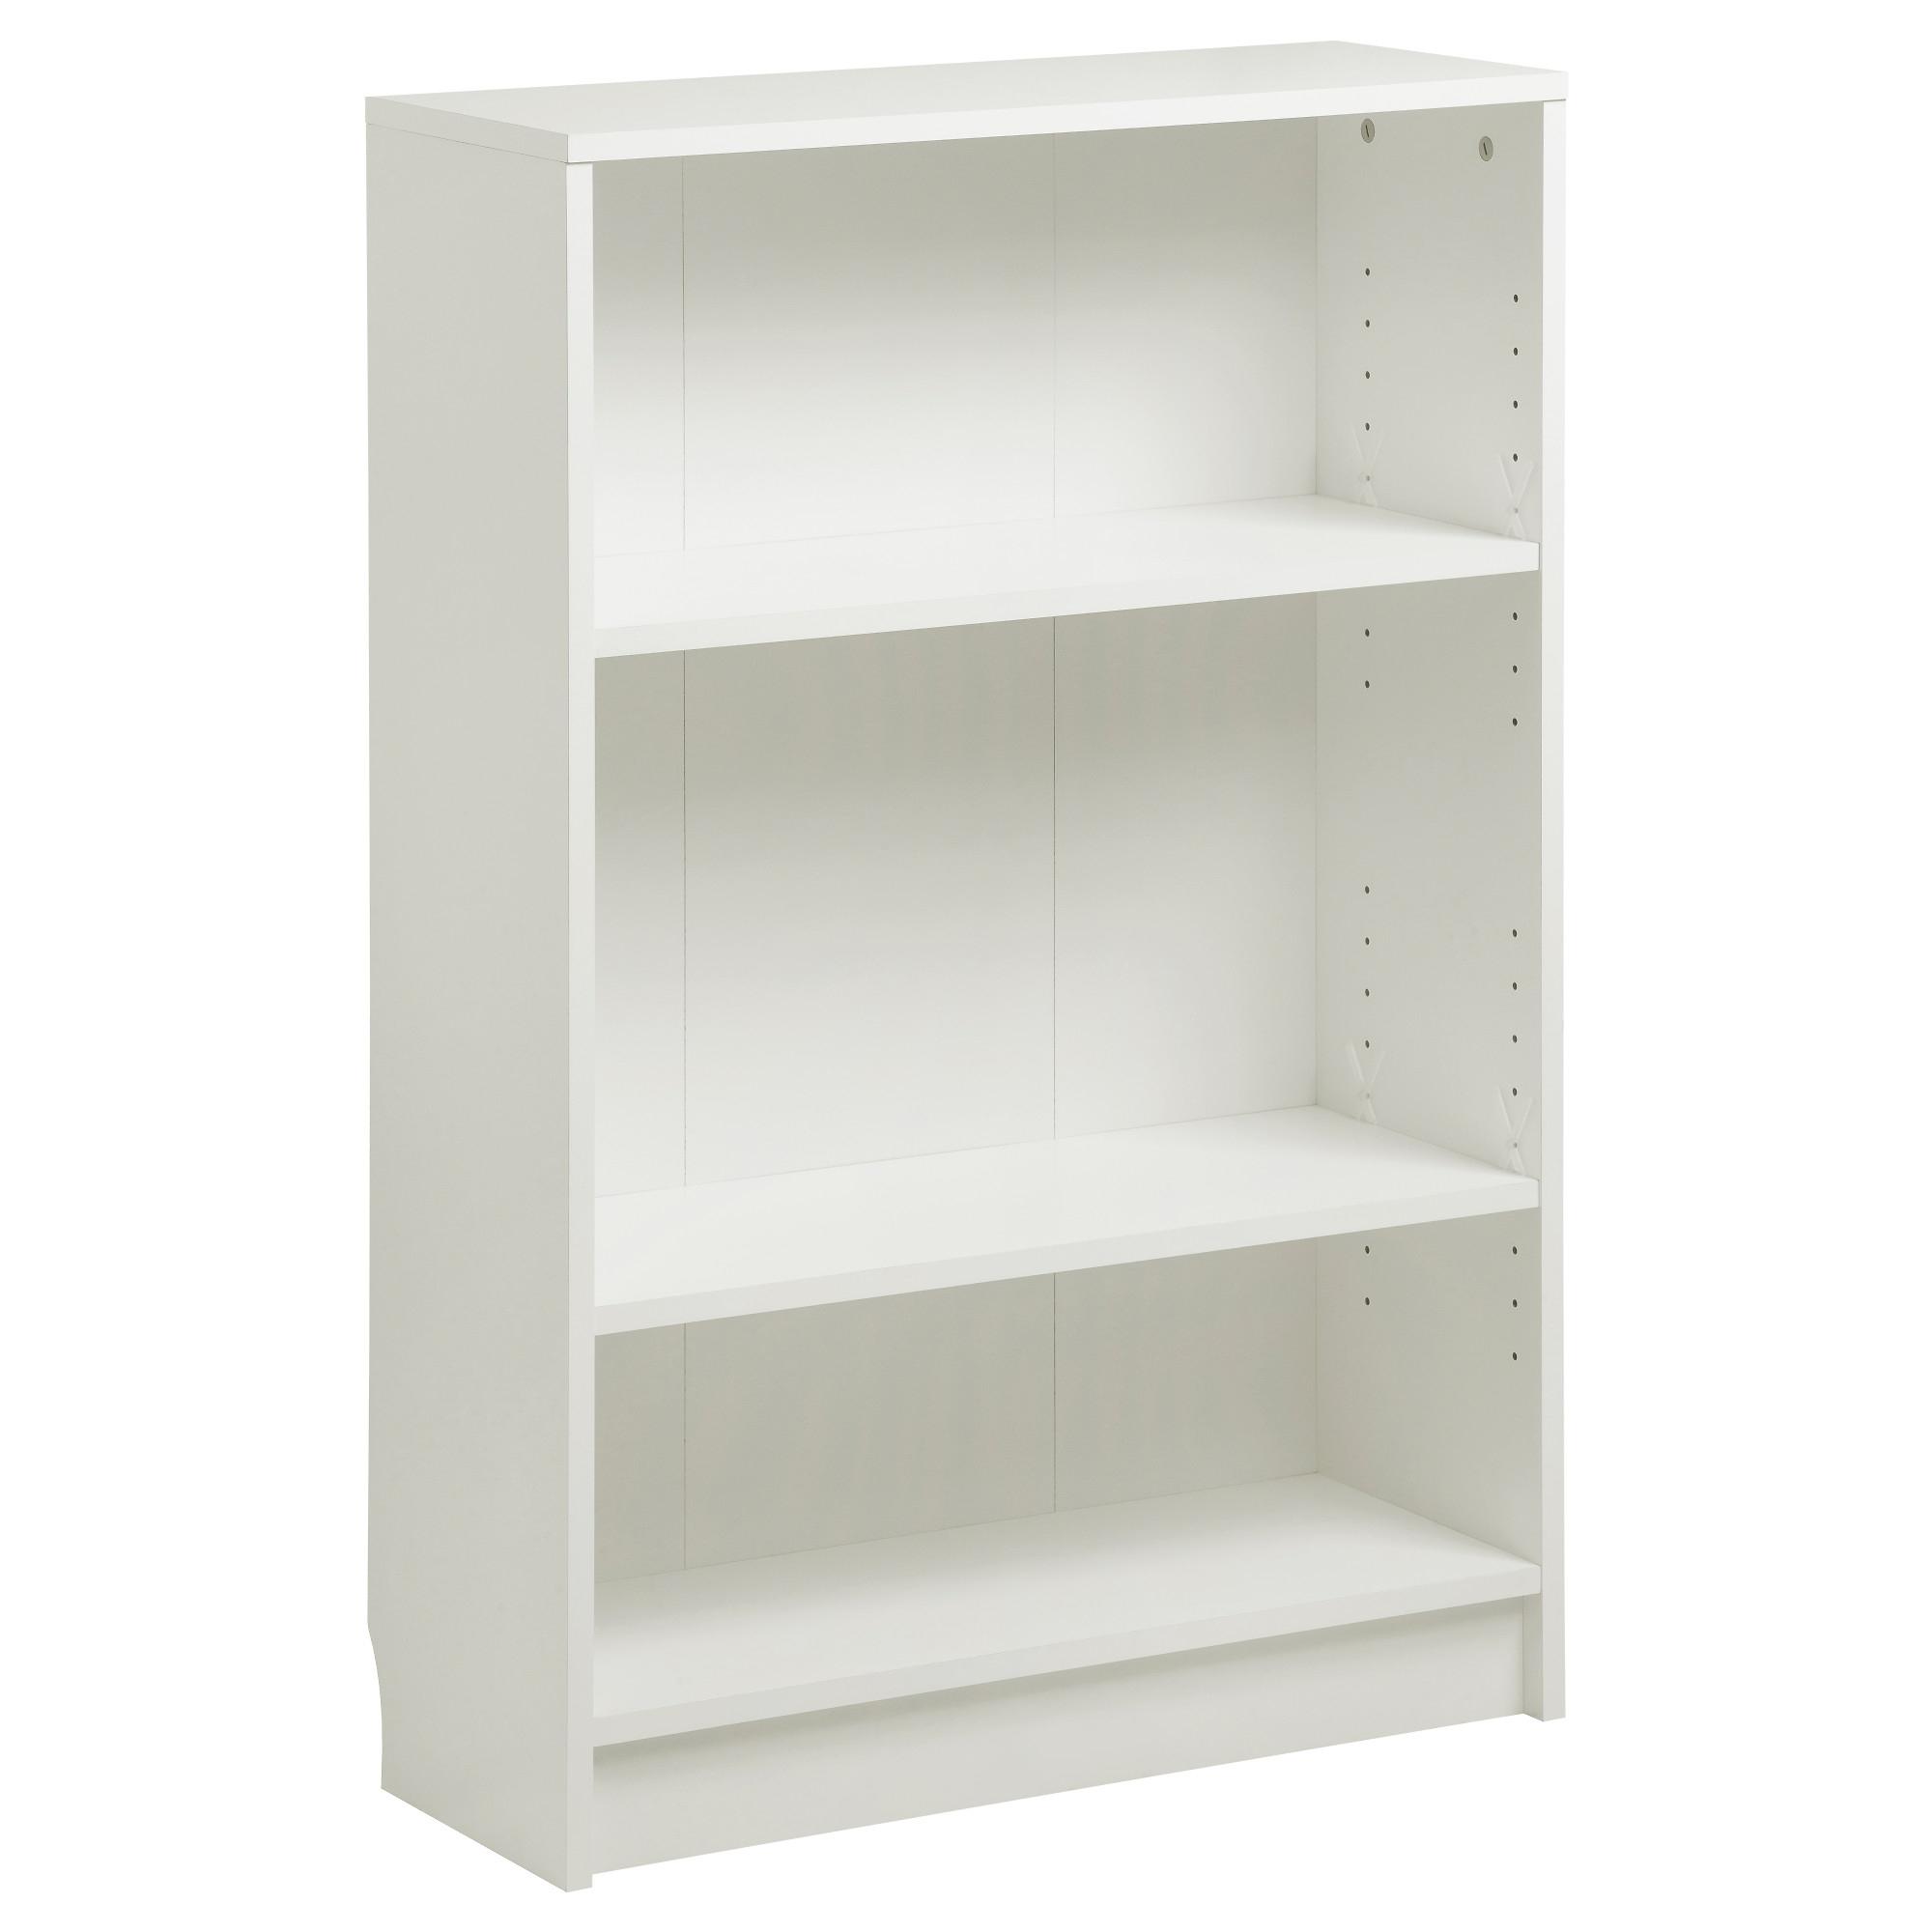 Ikea Regarding 2017 Ikea Corner Bookcases (Gallery 9 of 15)